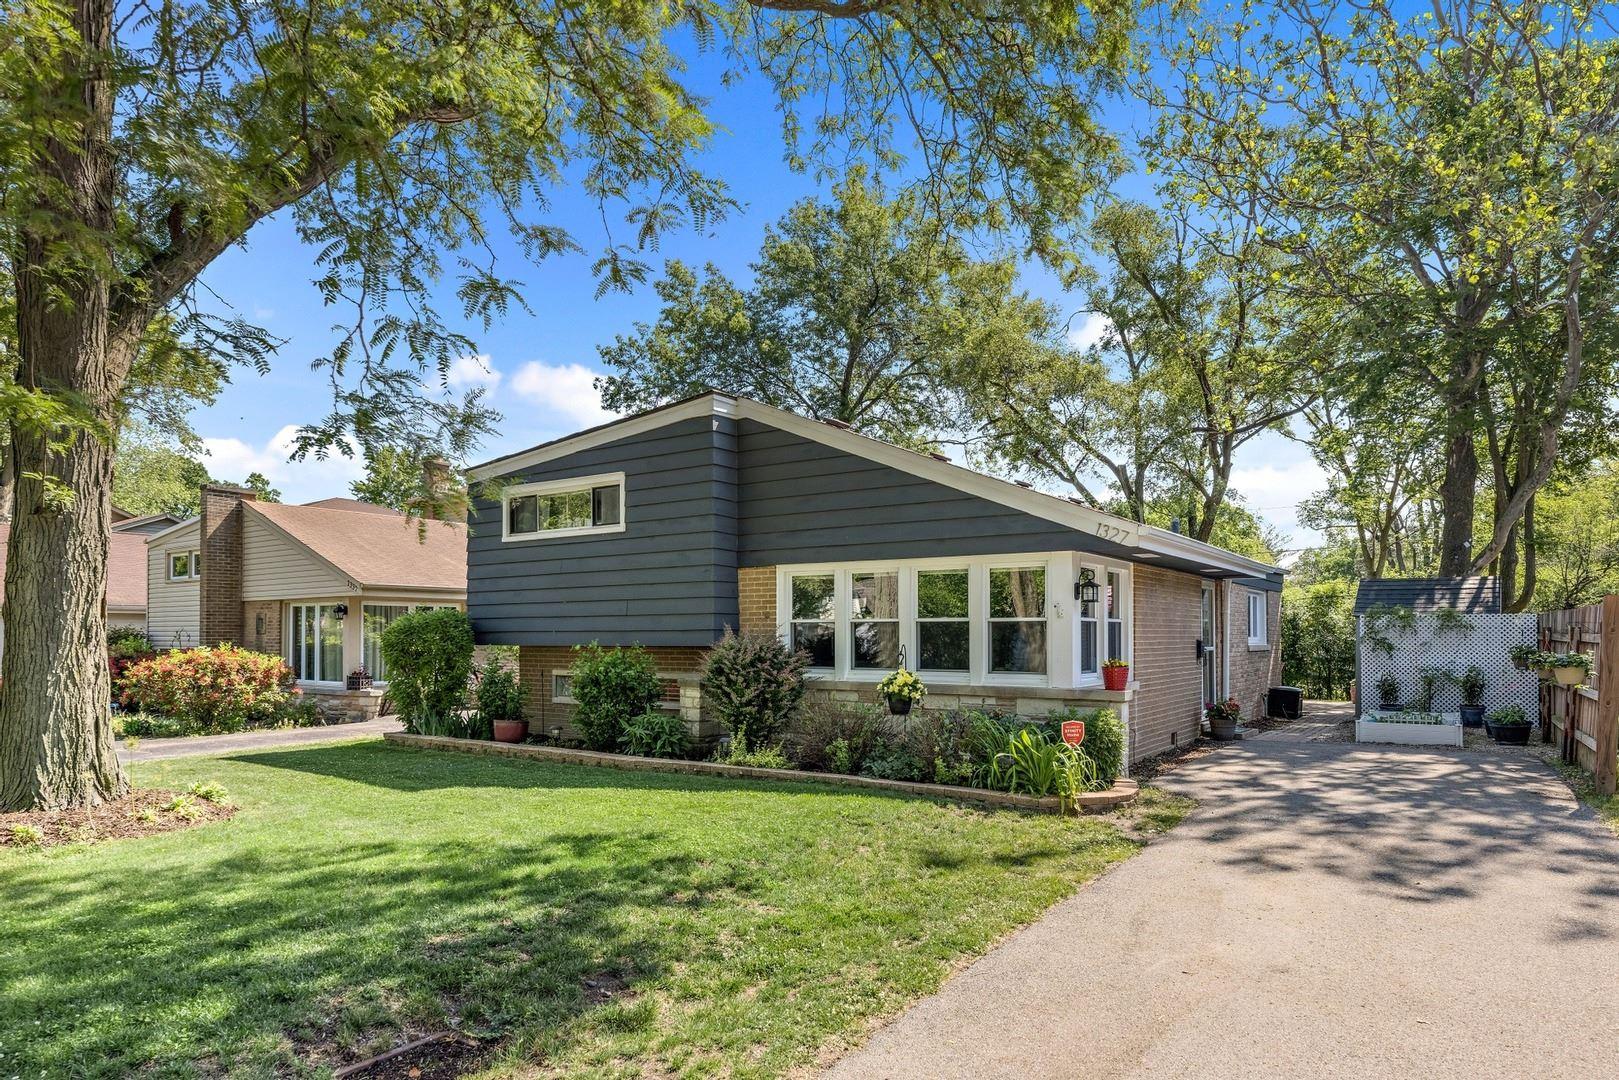 1327 Cavell Avenue, Highland Park, IL 60035 - #: 11118839